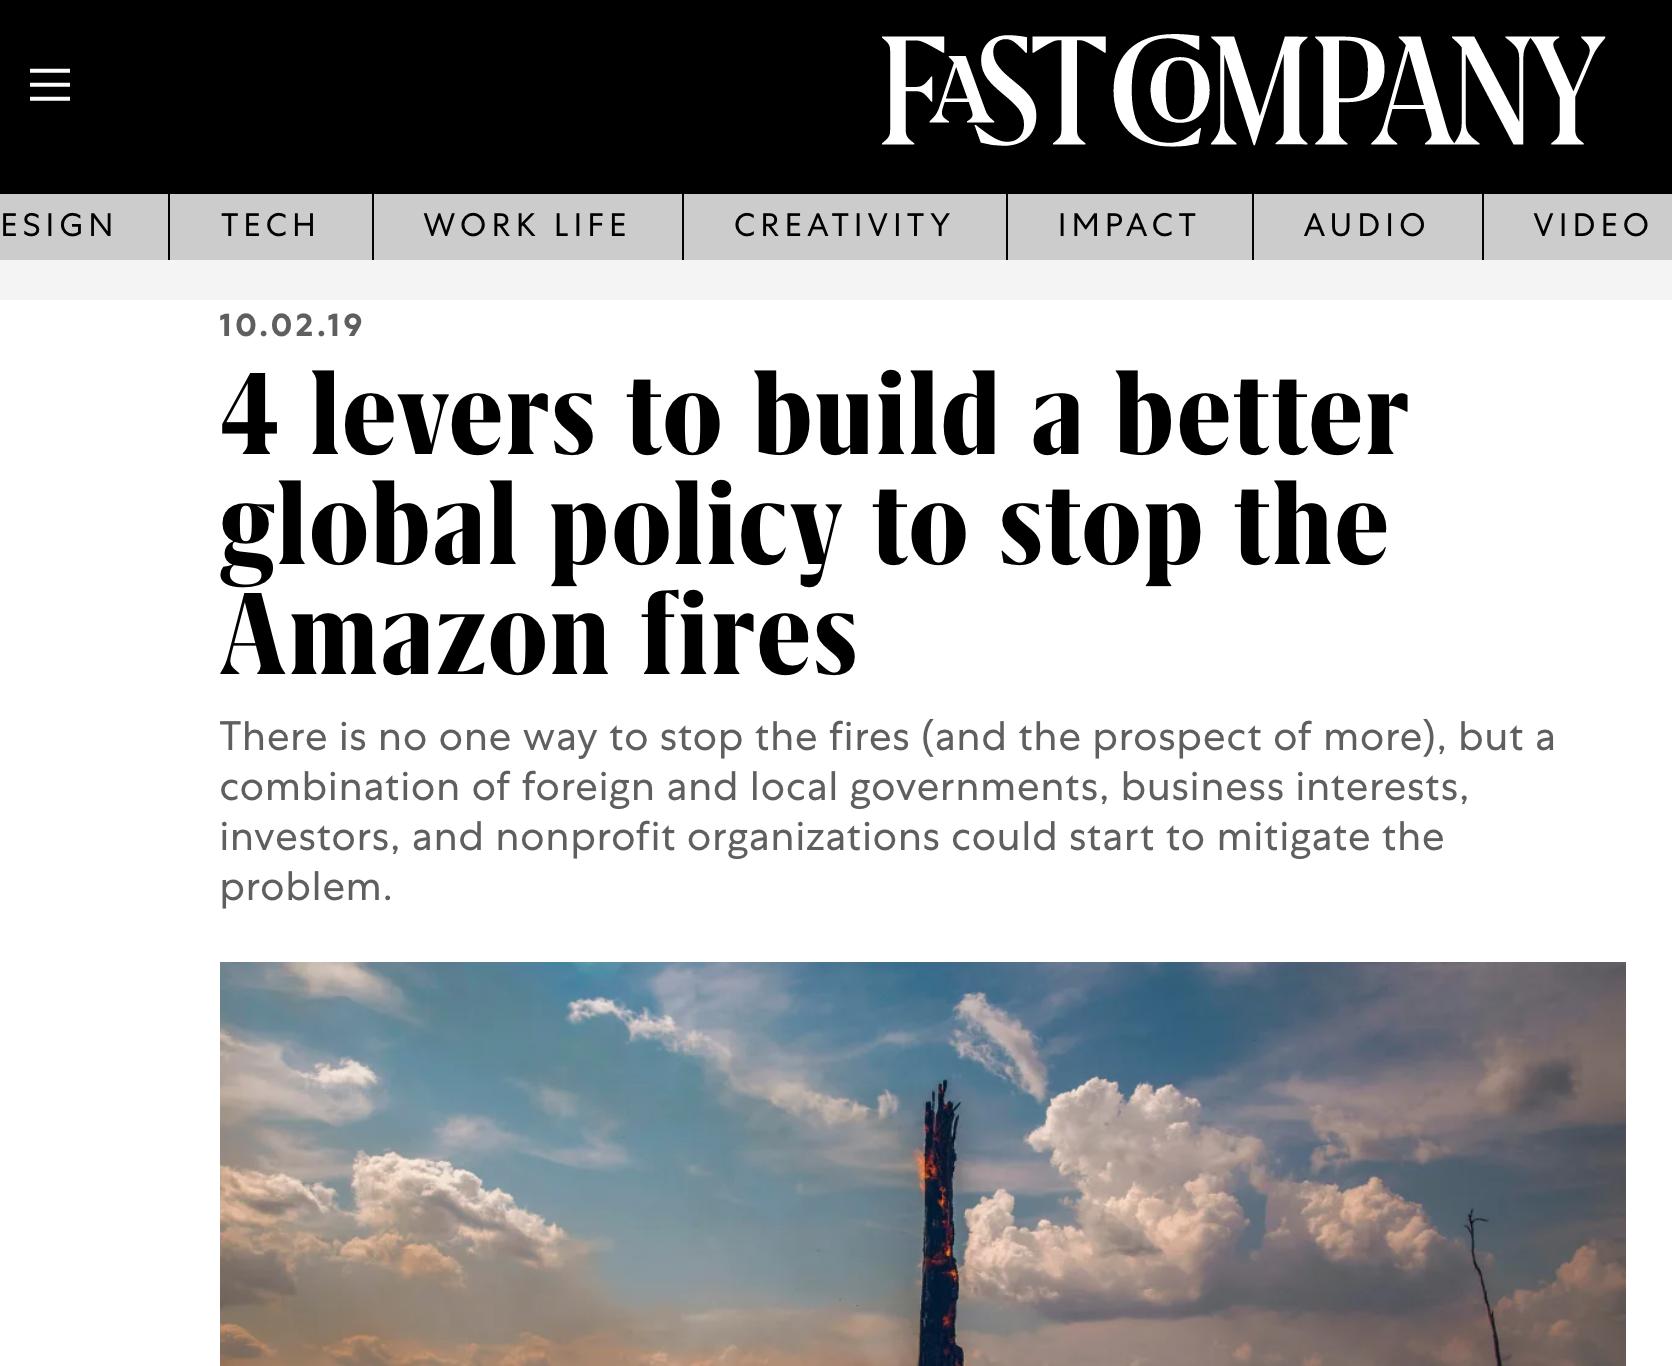 FAST COMPANY ARTICLE 10.02.19